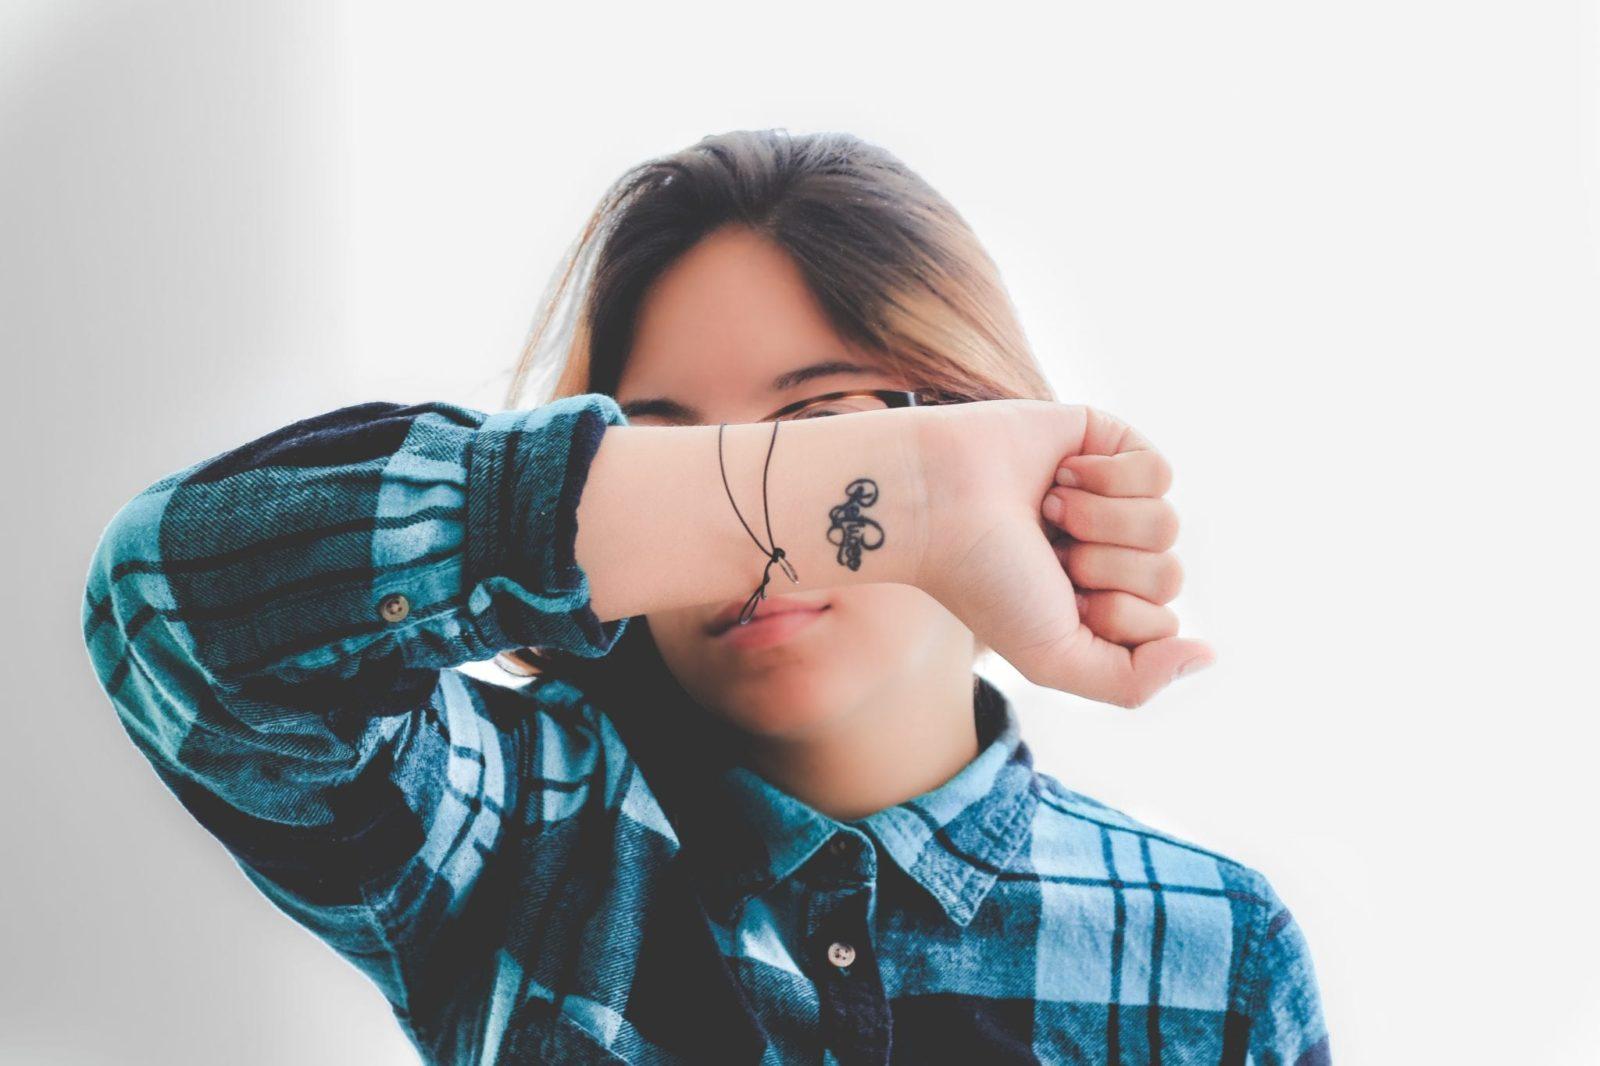 Tattoo Removal in Boulder, Colorado